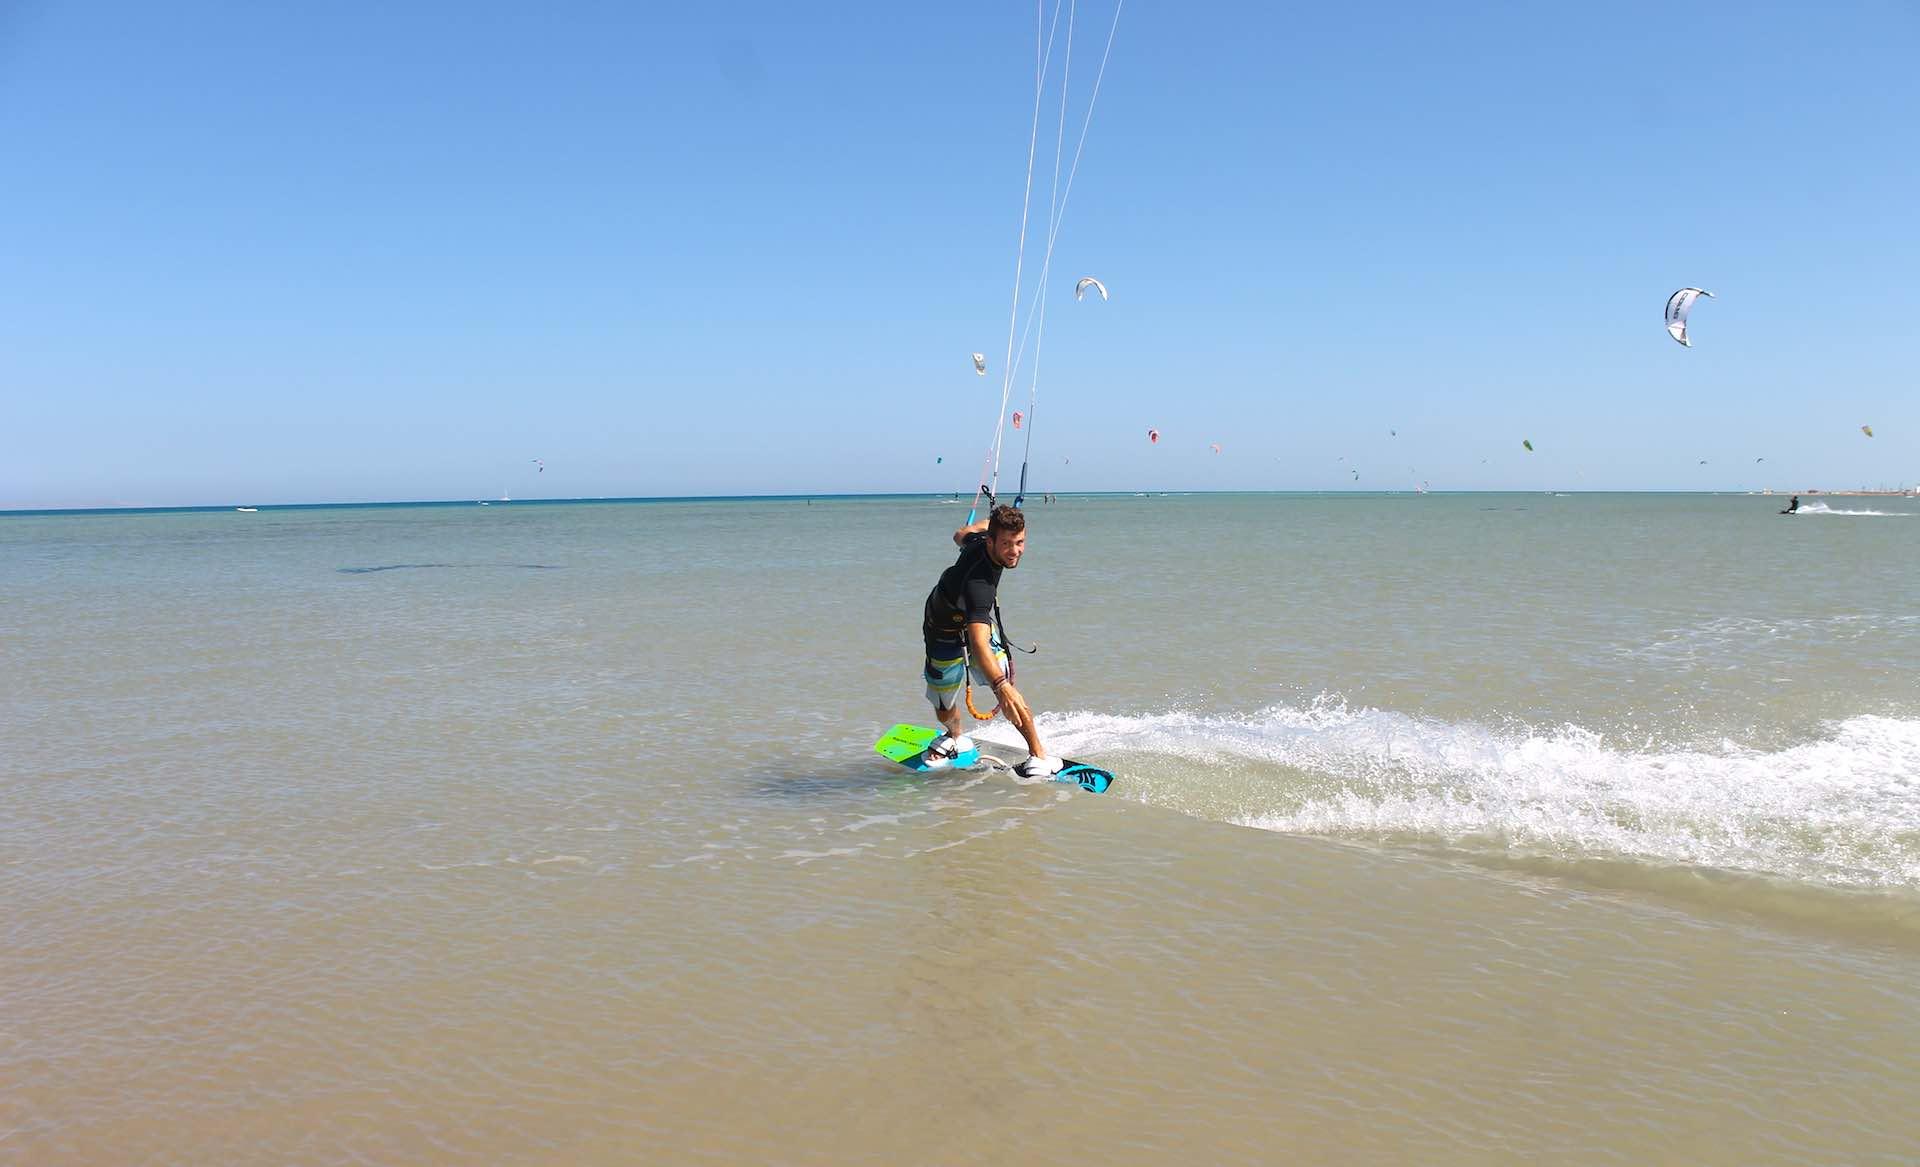 kitesurfing holidays egypt. Private kitesurfing lessons for advanced riders